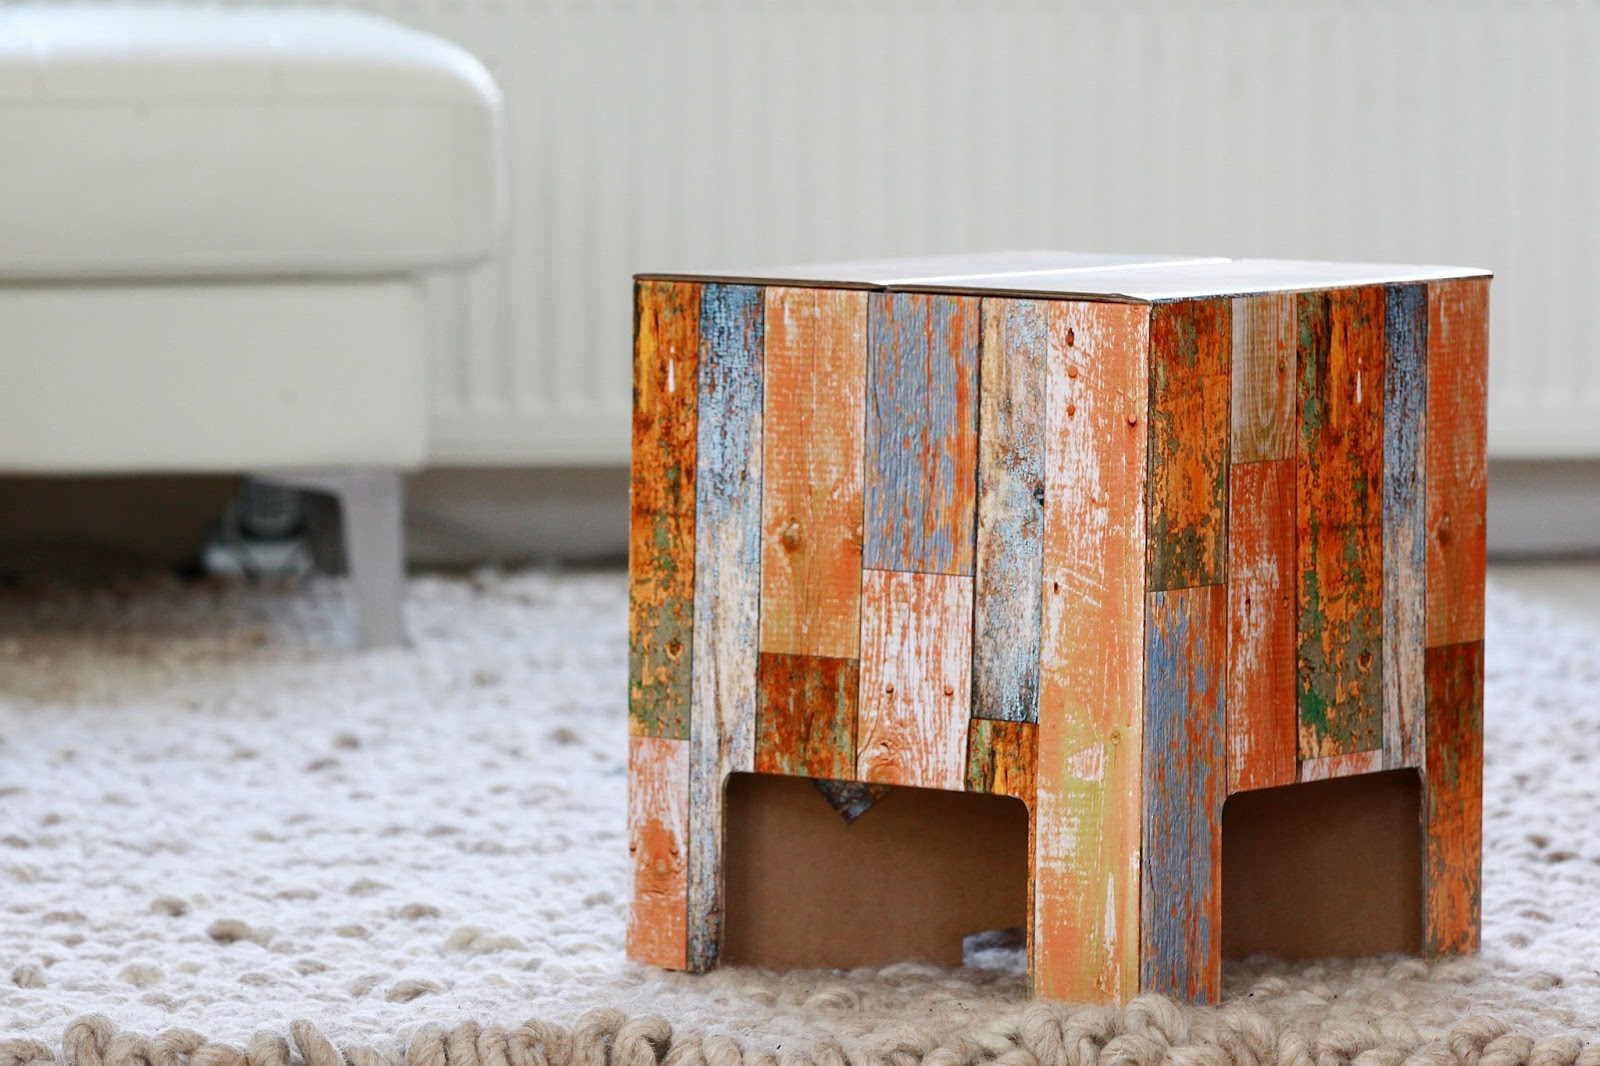 Furniture made of cardboard - a revolution in interior design 80